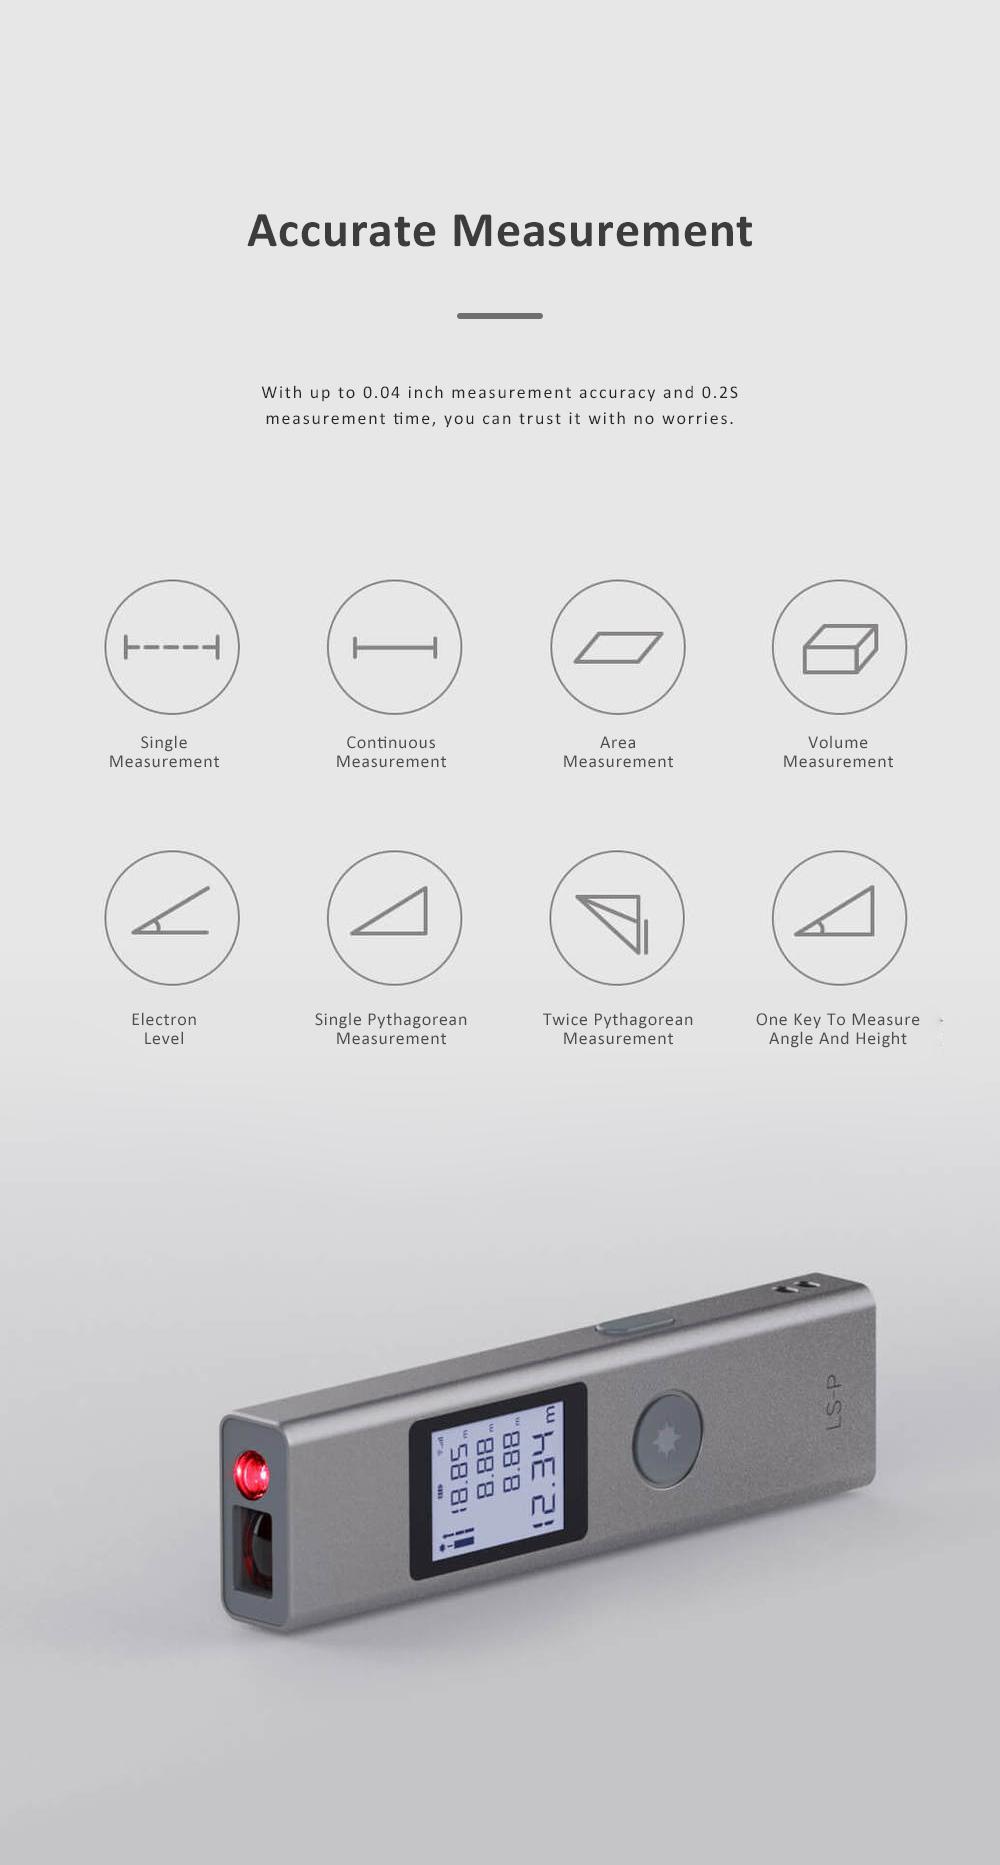 Xiaomi DUKA LS-P Laser Distance Rangefinder Mini Hand-held Digital Distance Meter with 200mAh Battery for Distance Area Volume Measurement 2